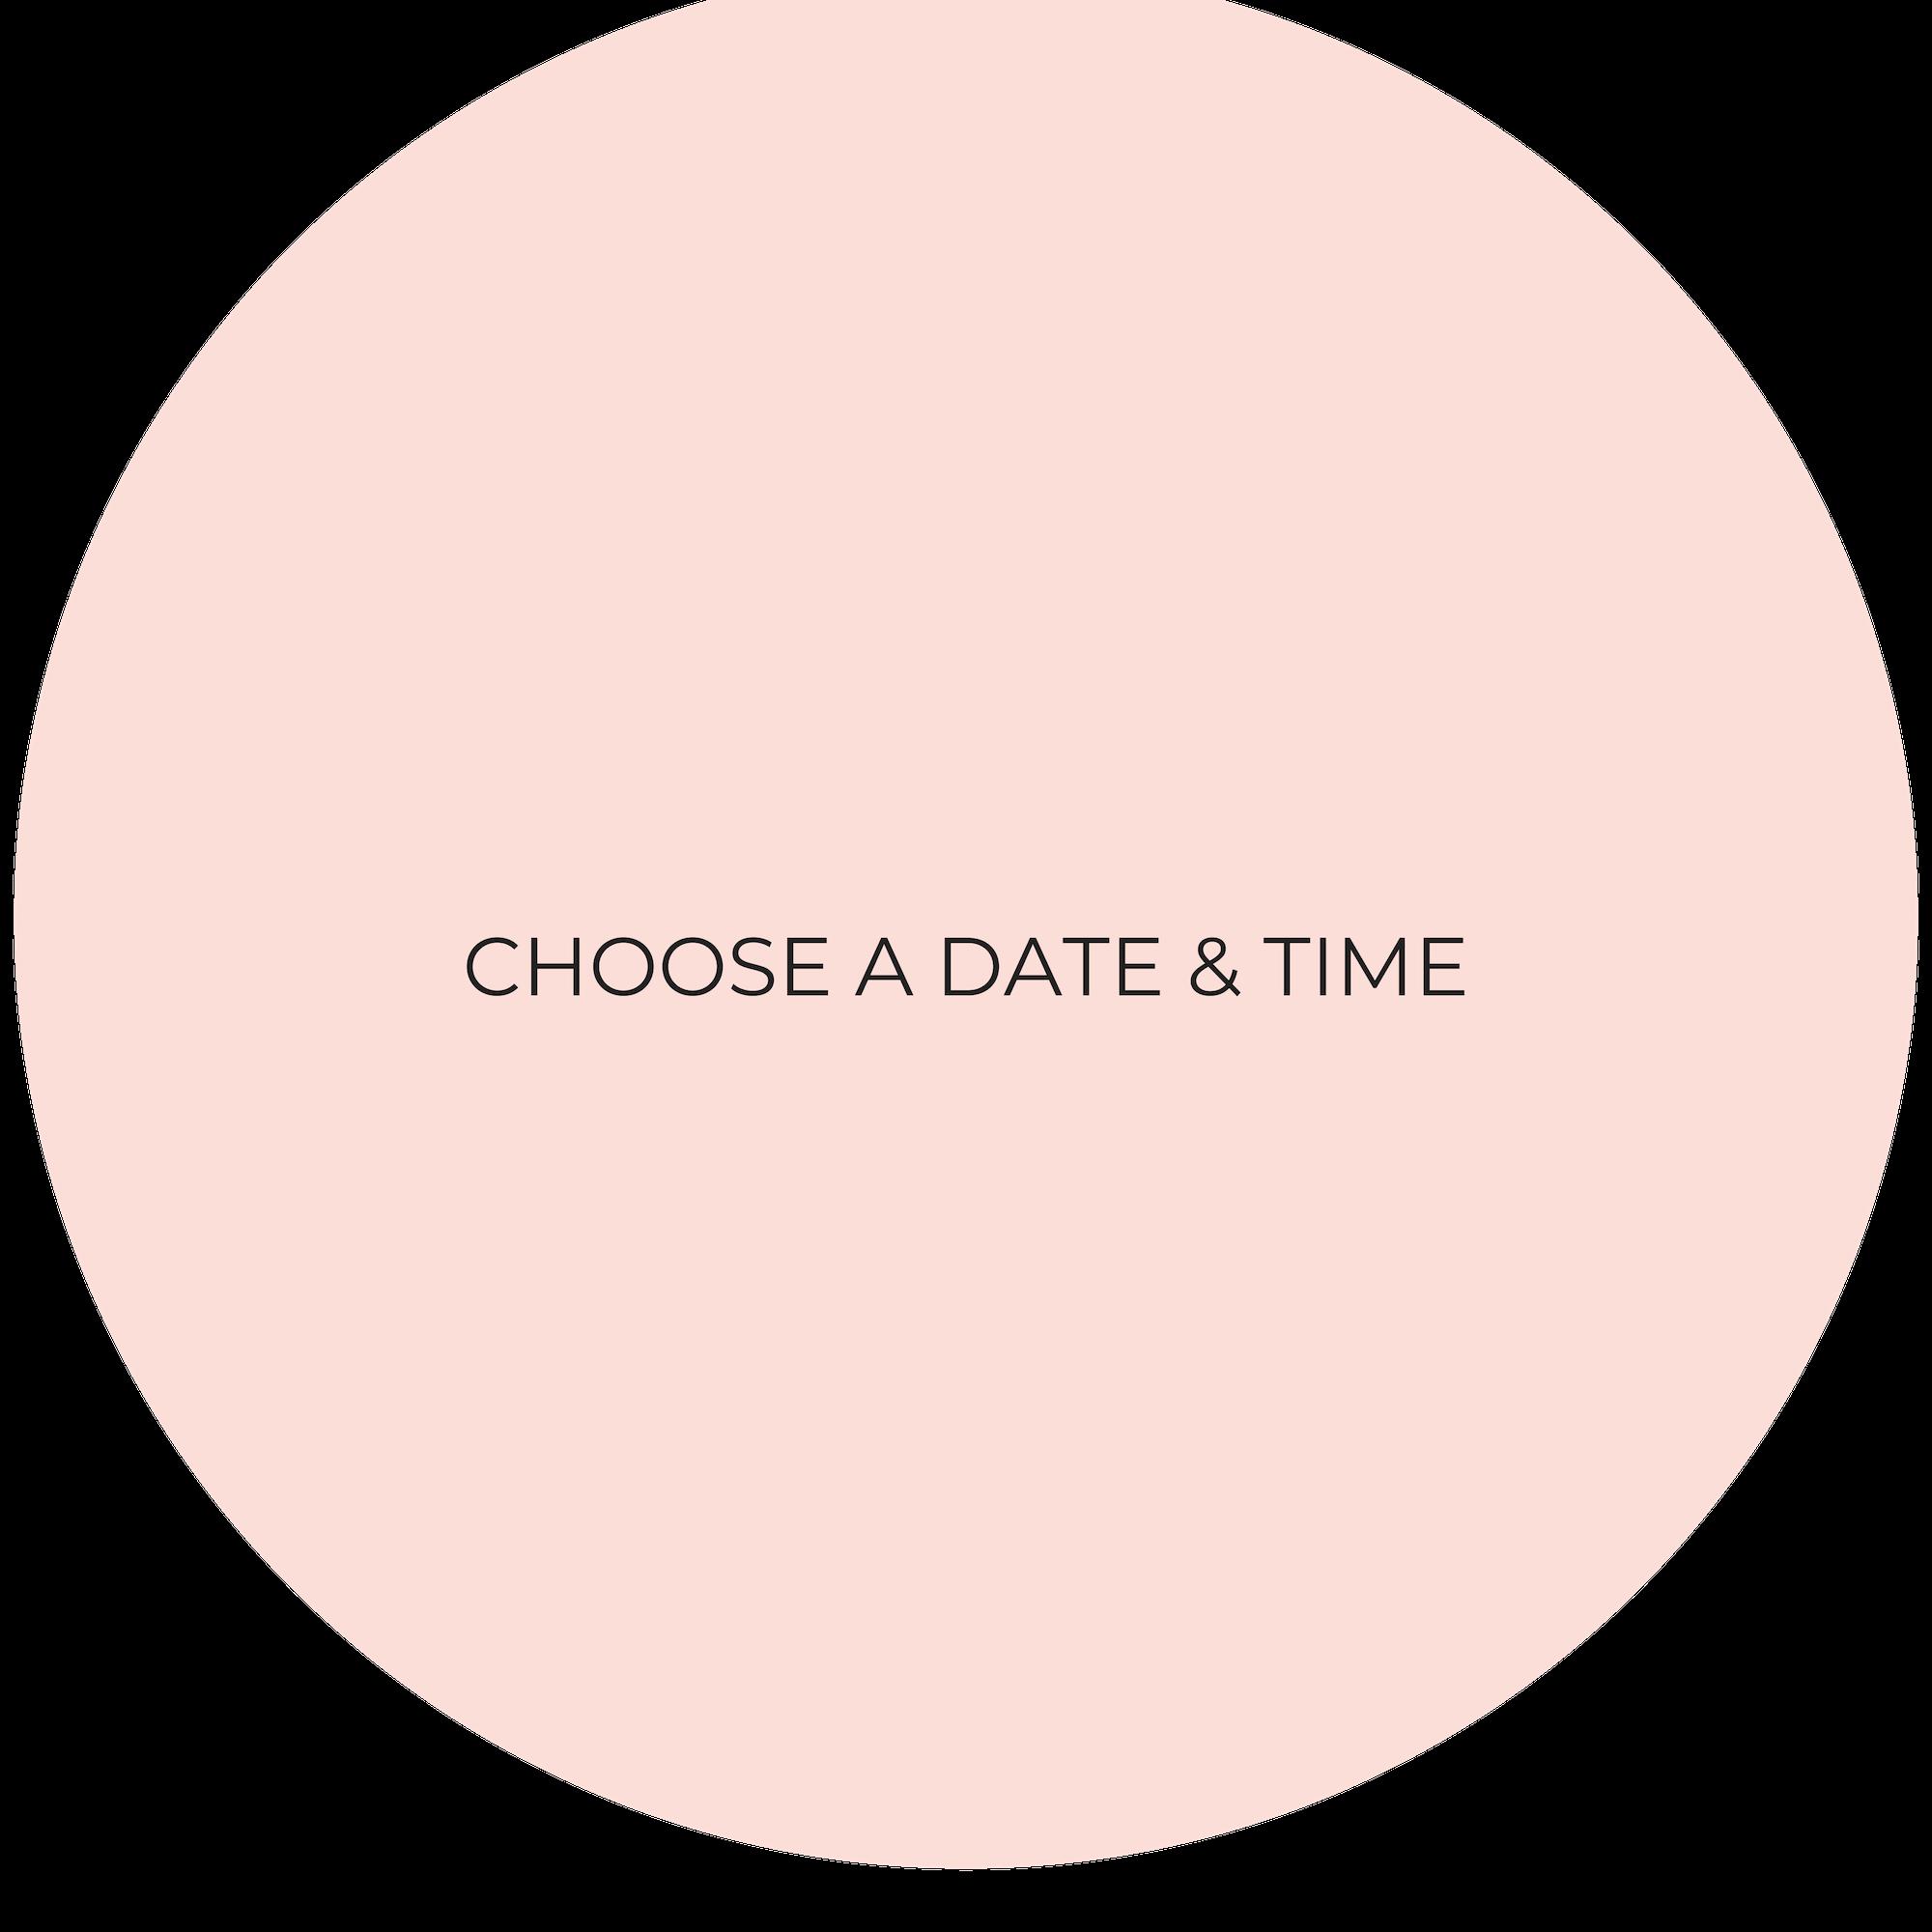 lt pink circle image.png